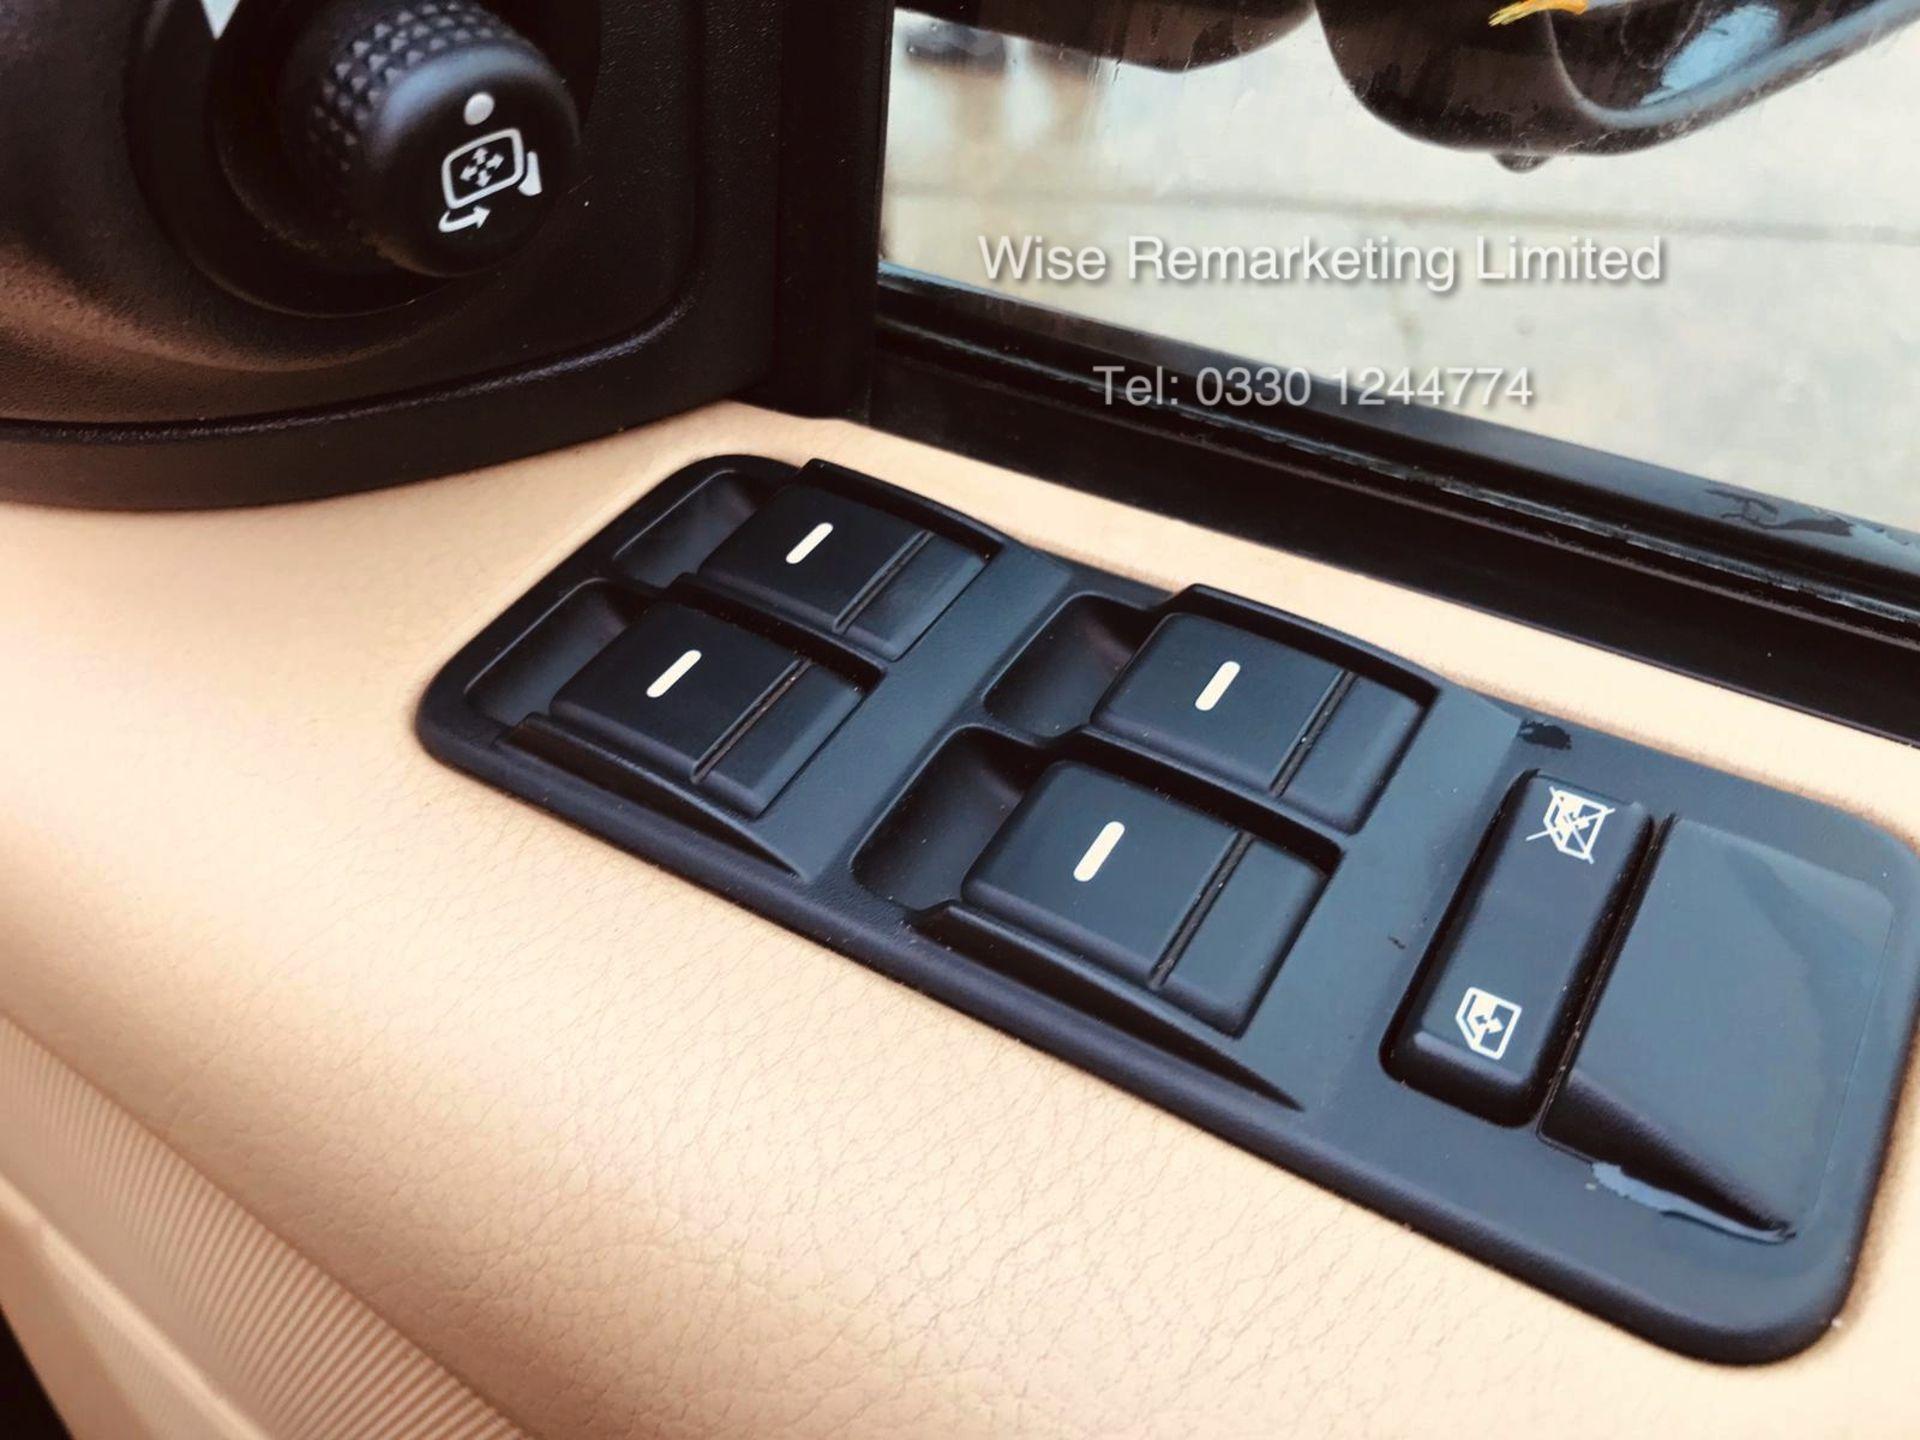 Range Rover Sport 2.7 TDV6 HSE Auto - 2008 Model - Cream Leather - Sat Nav - Heated Seats - Image 10 of 19